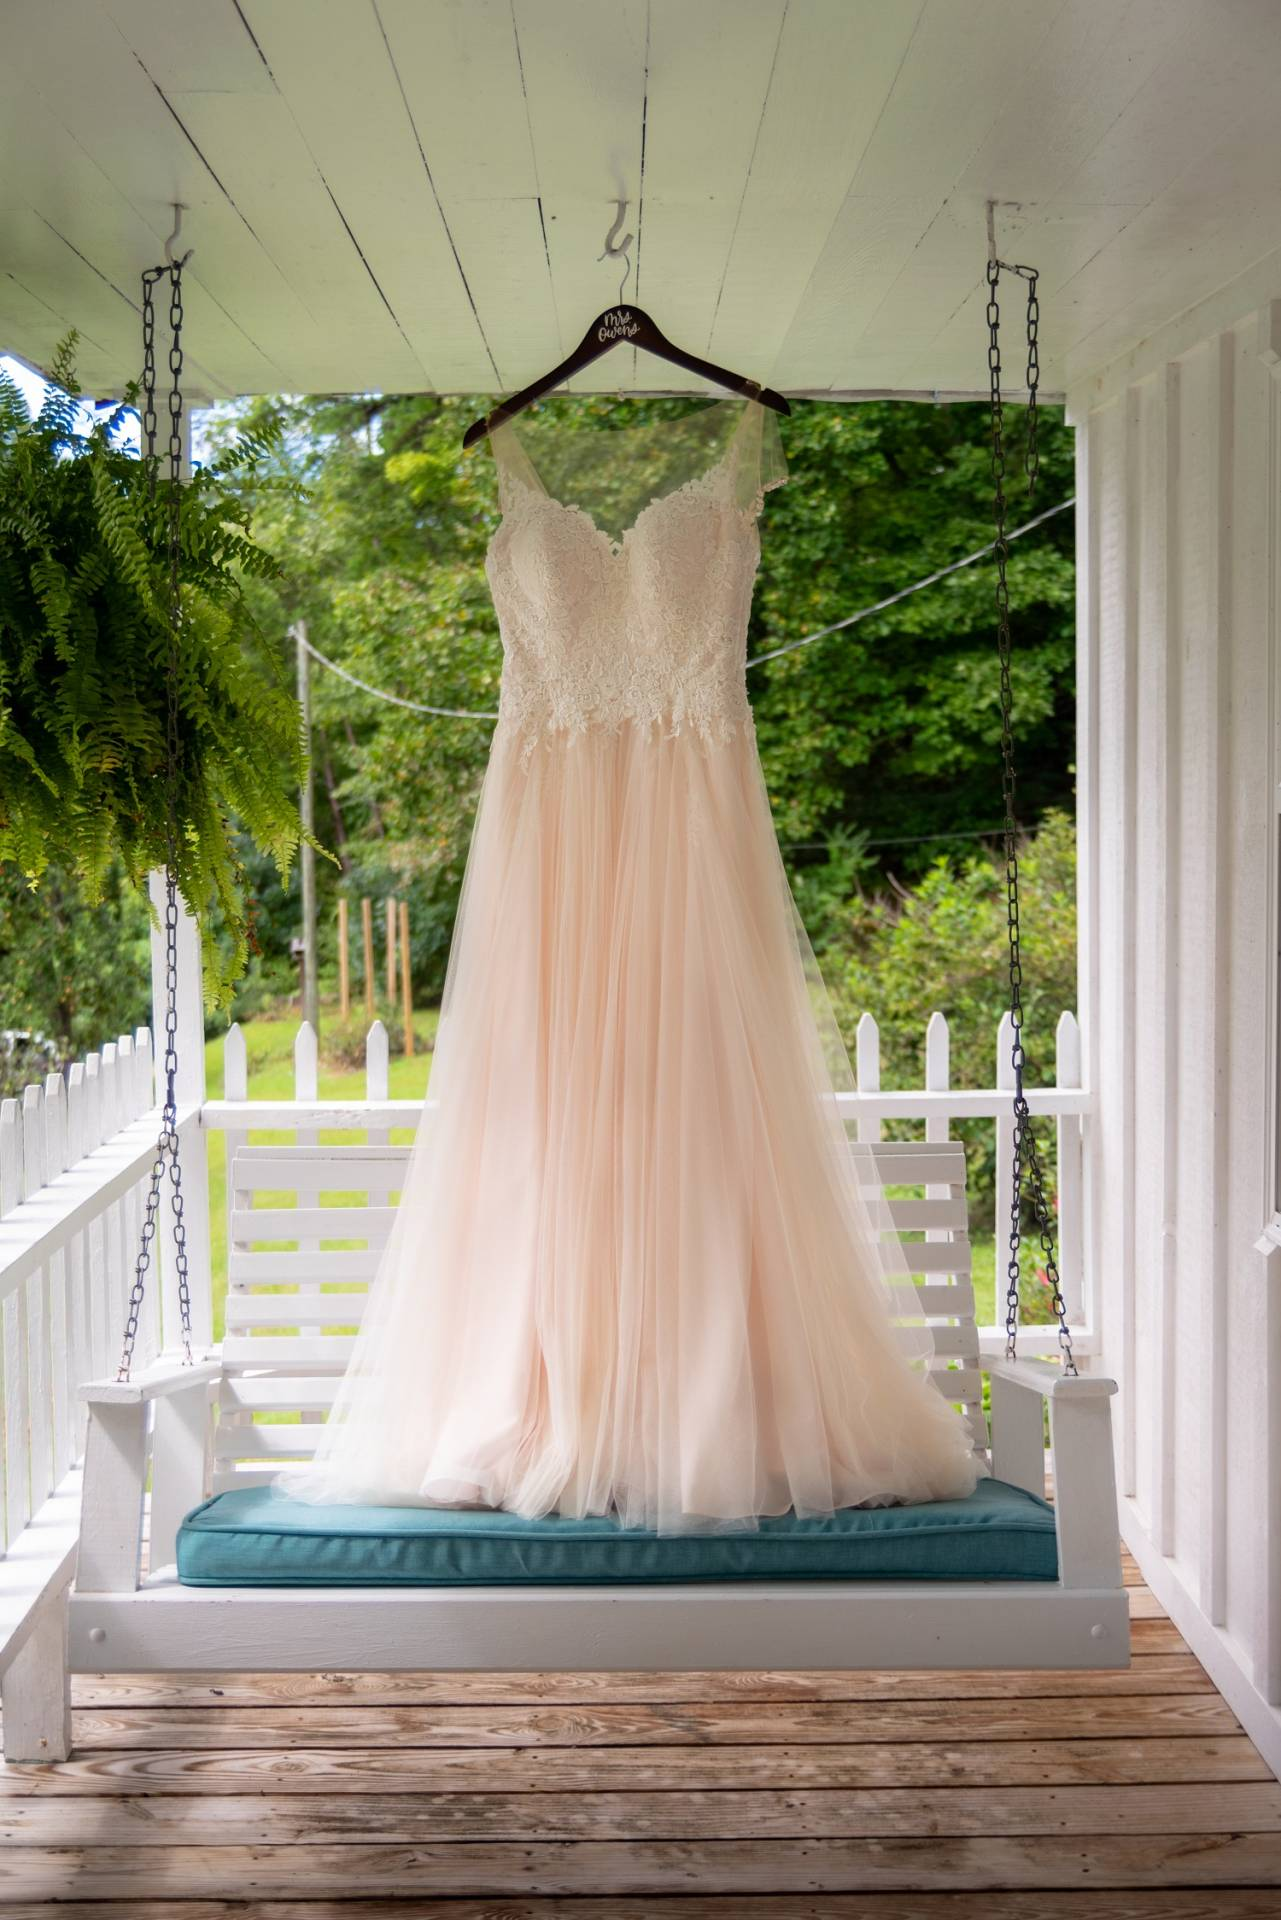 white wedding dress, wedding dress pinterest, wedding dress instagram, mountain wedding, Smoky Mountain wedding, Smoky Mountain wedding photography, Pigeon Forge wedding photography